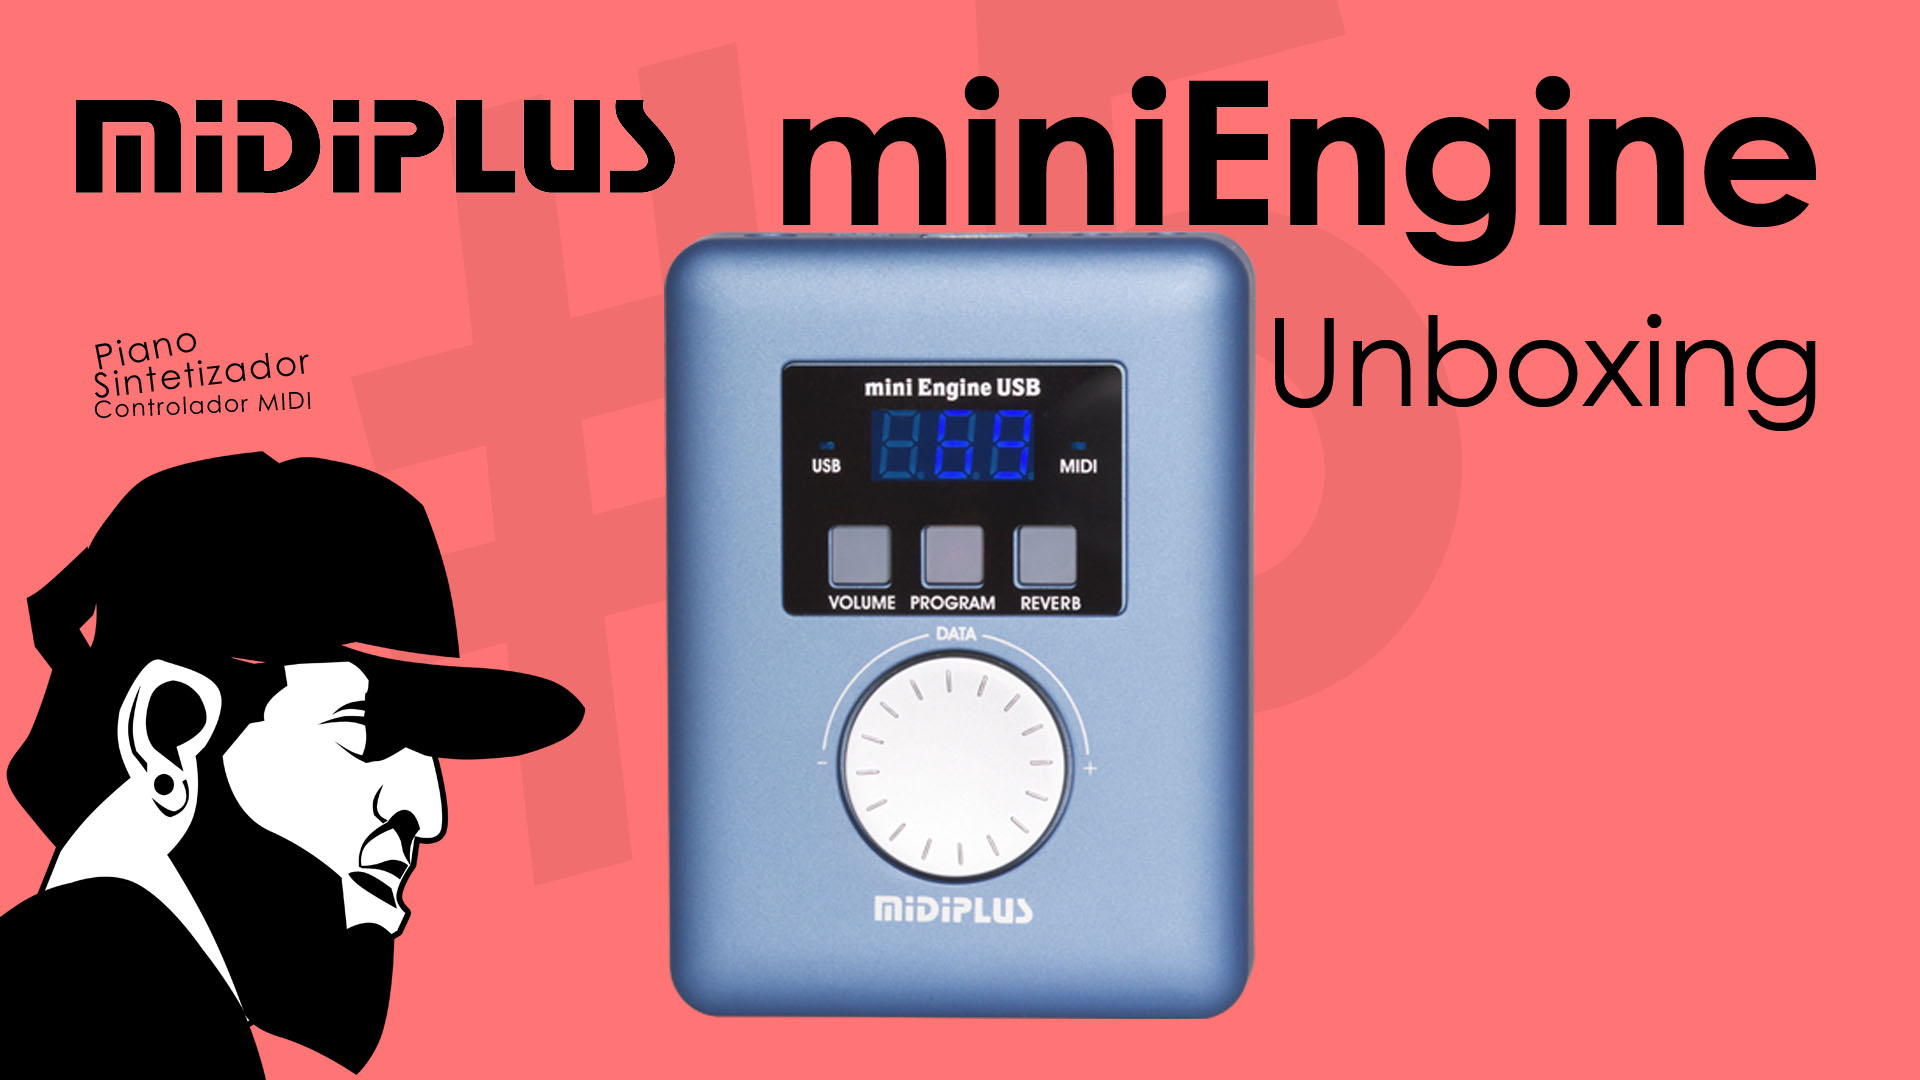 MIDIPLUS miniEngine USB MIDI Source – Teclado Musical Bom e Barato #1 (Unboxing)